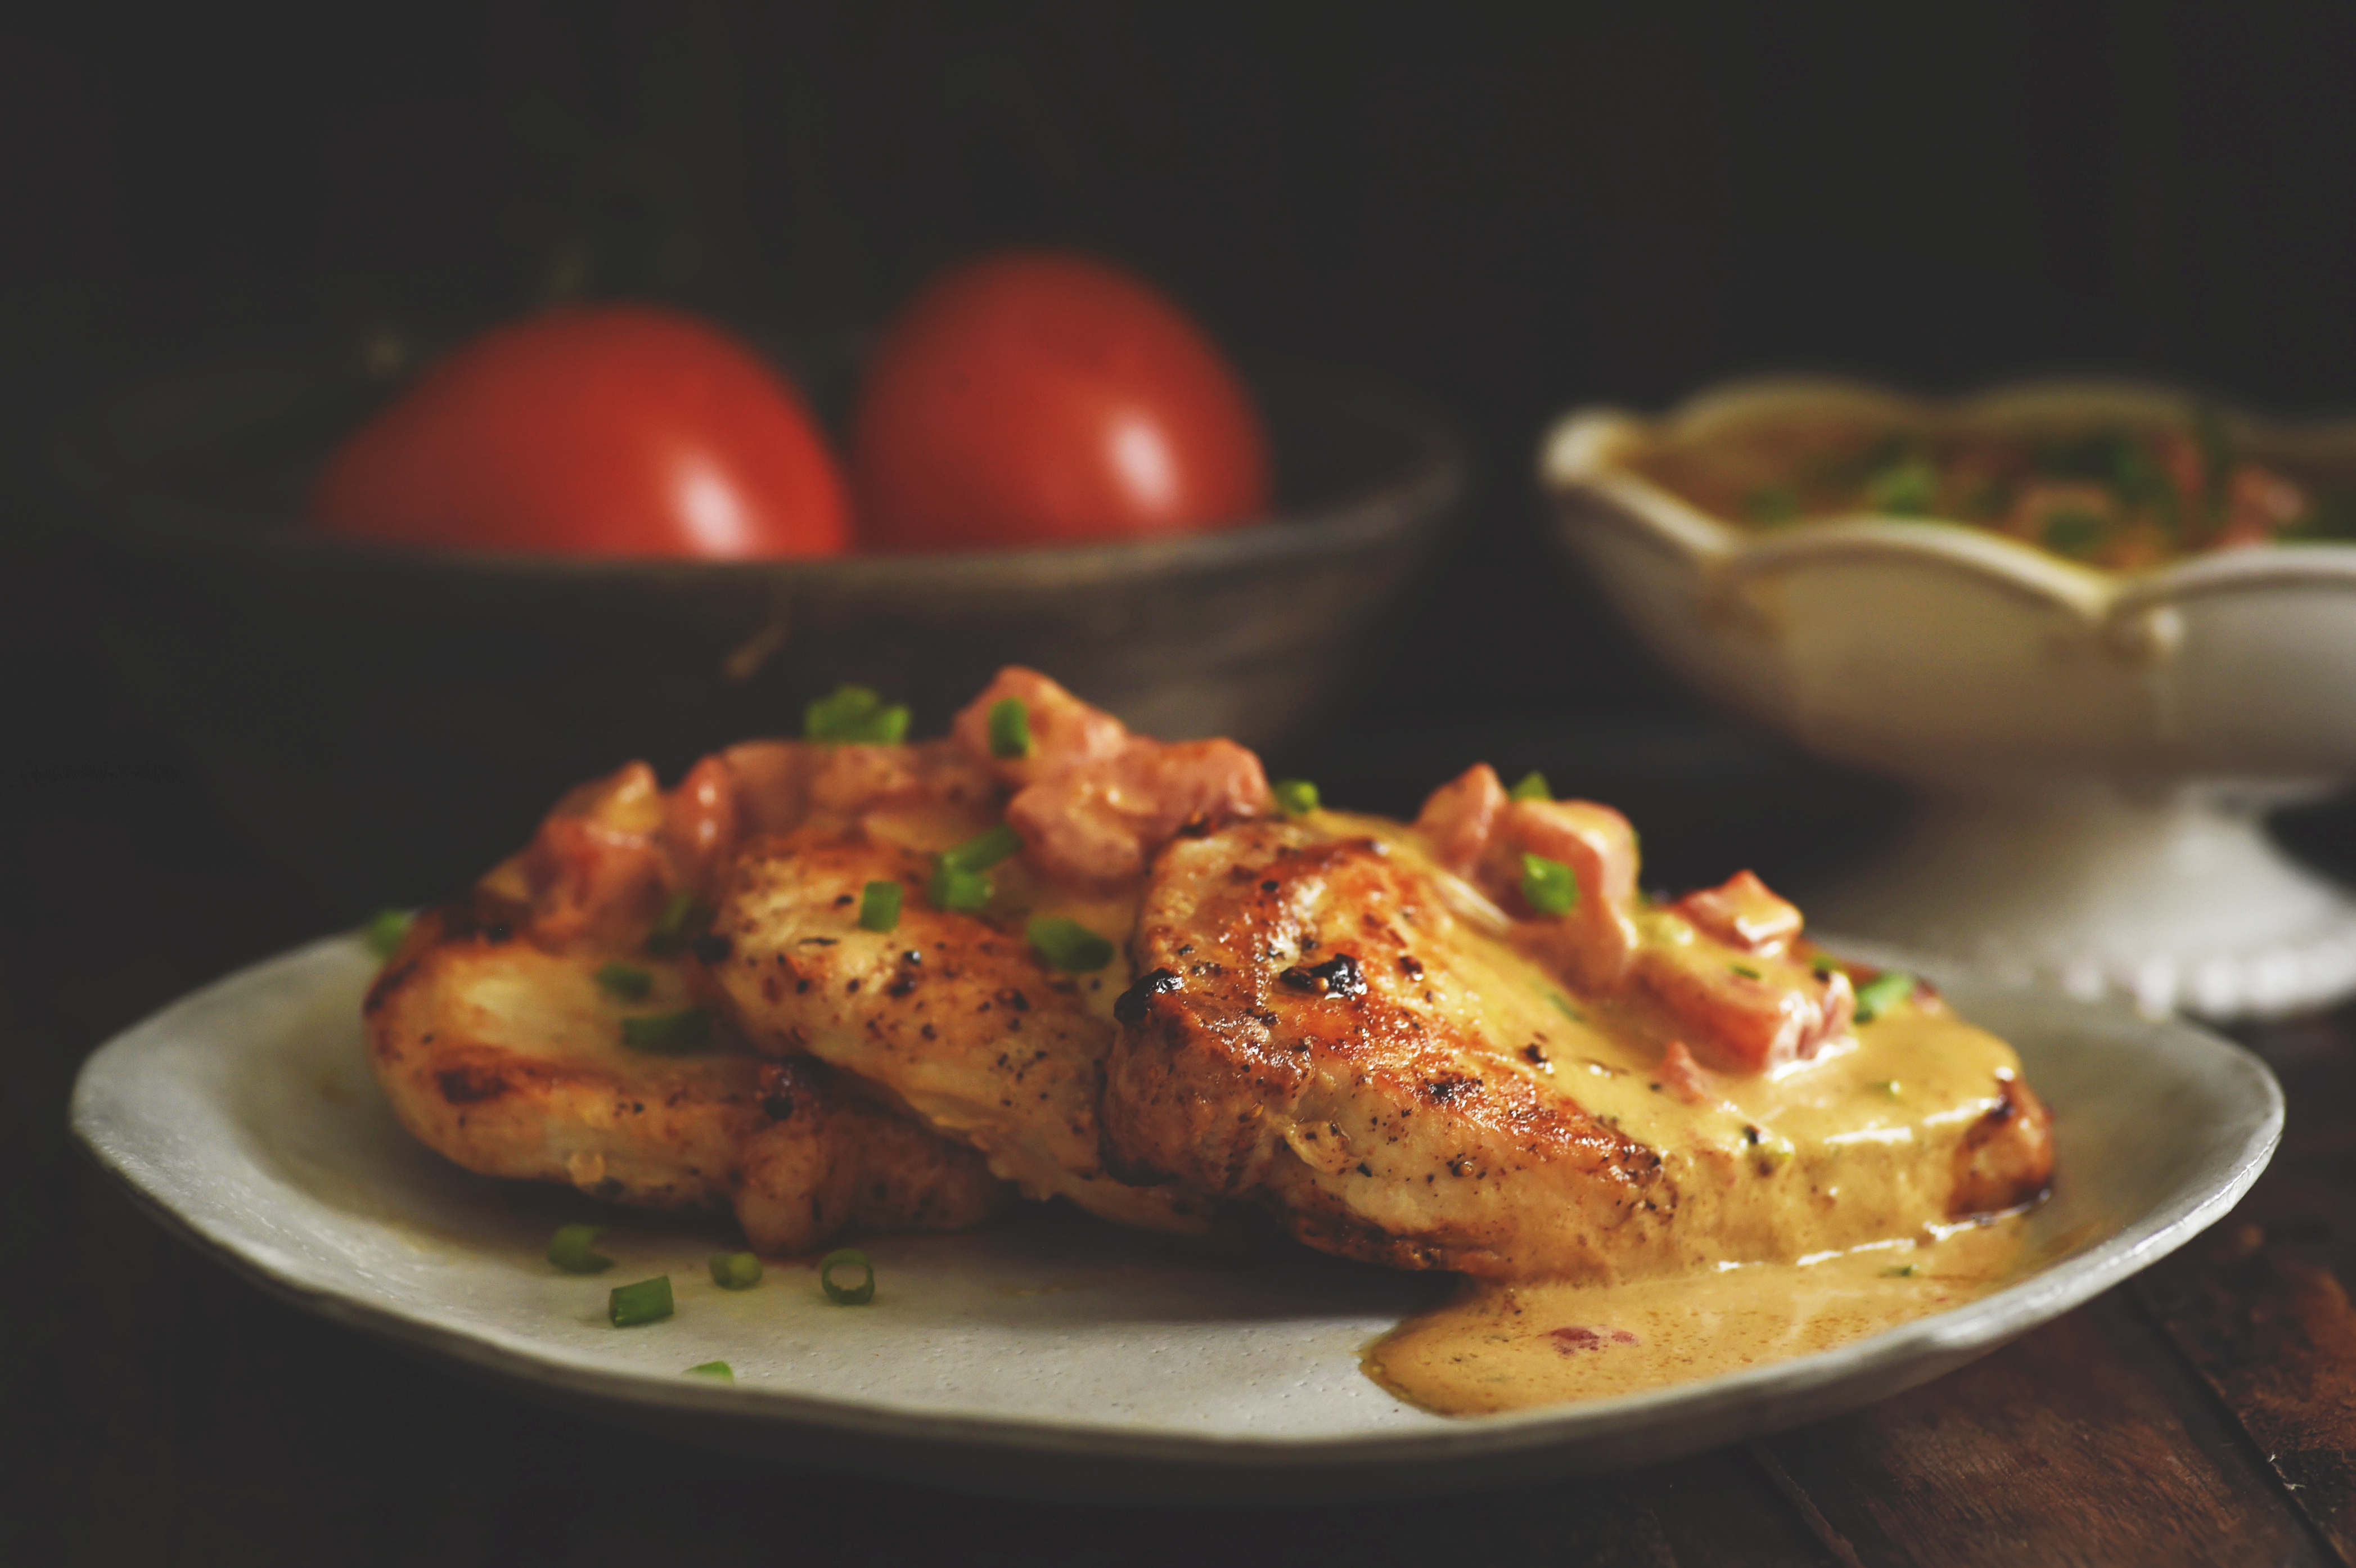 Boneless Pork Chops with Tomato Cream Sauce Recipe